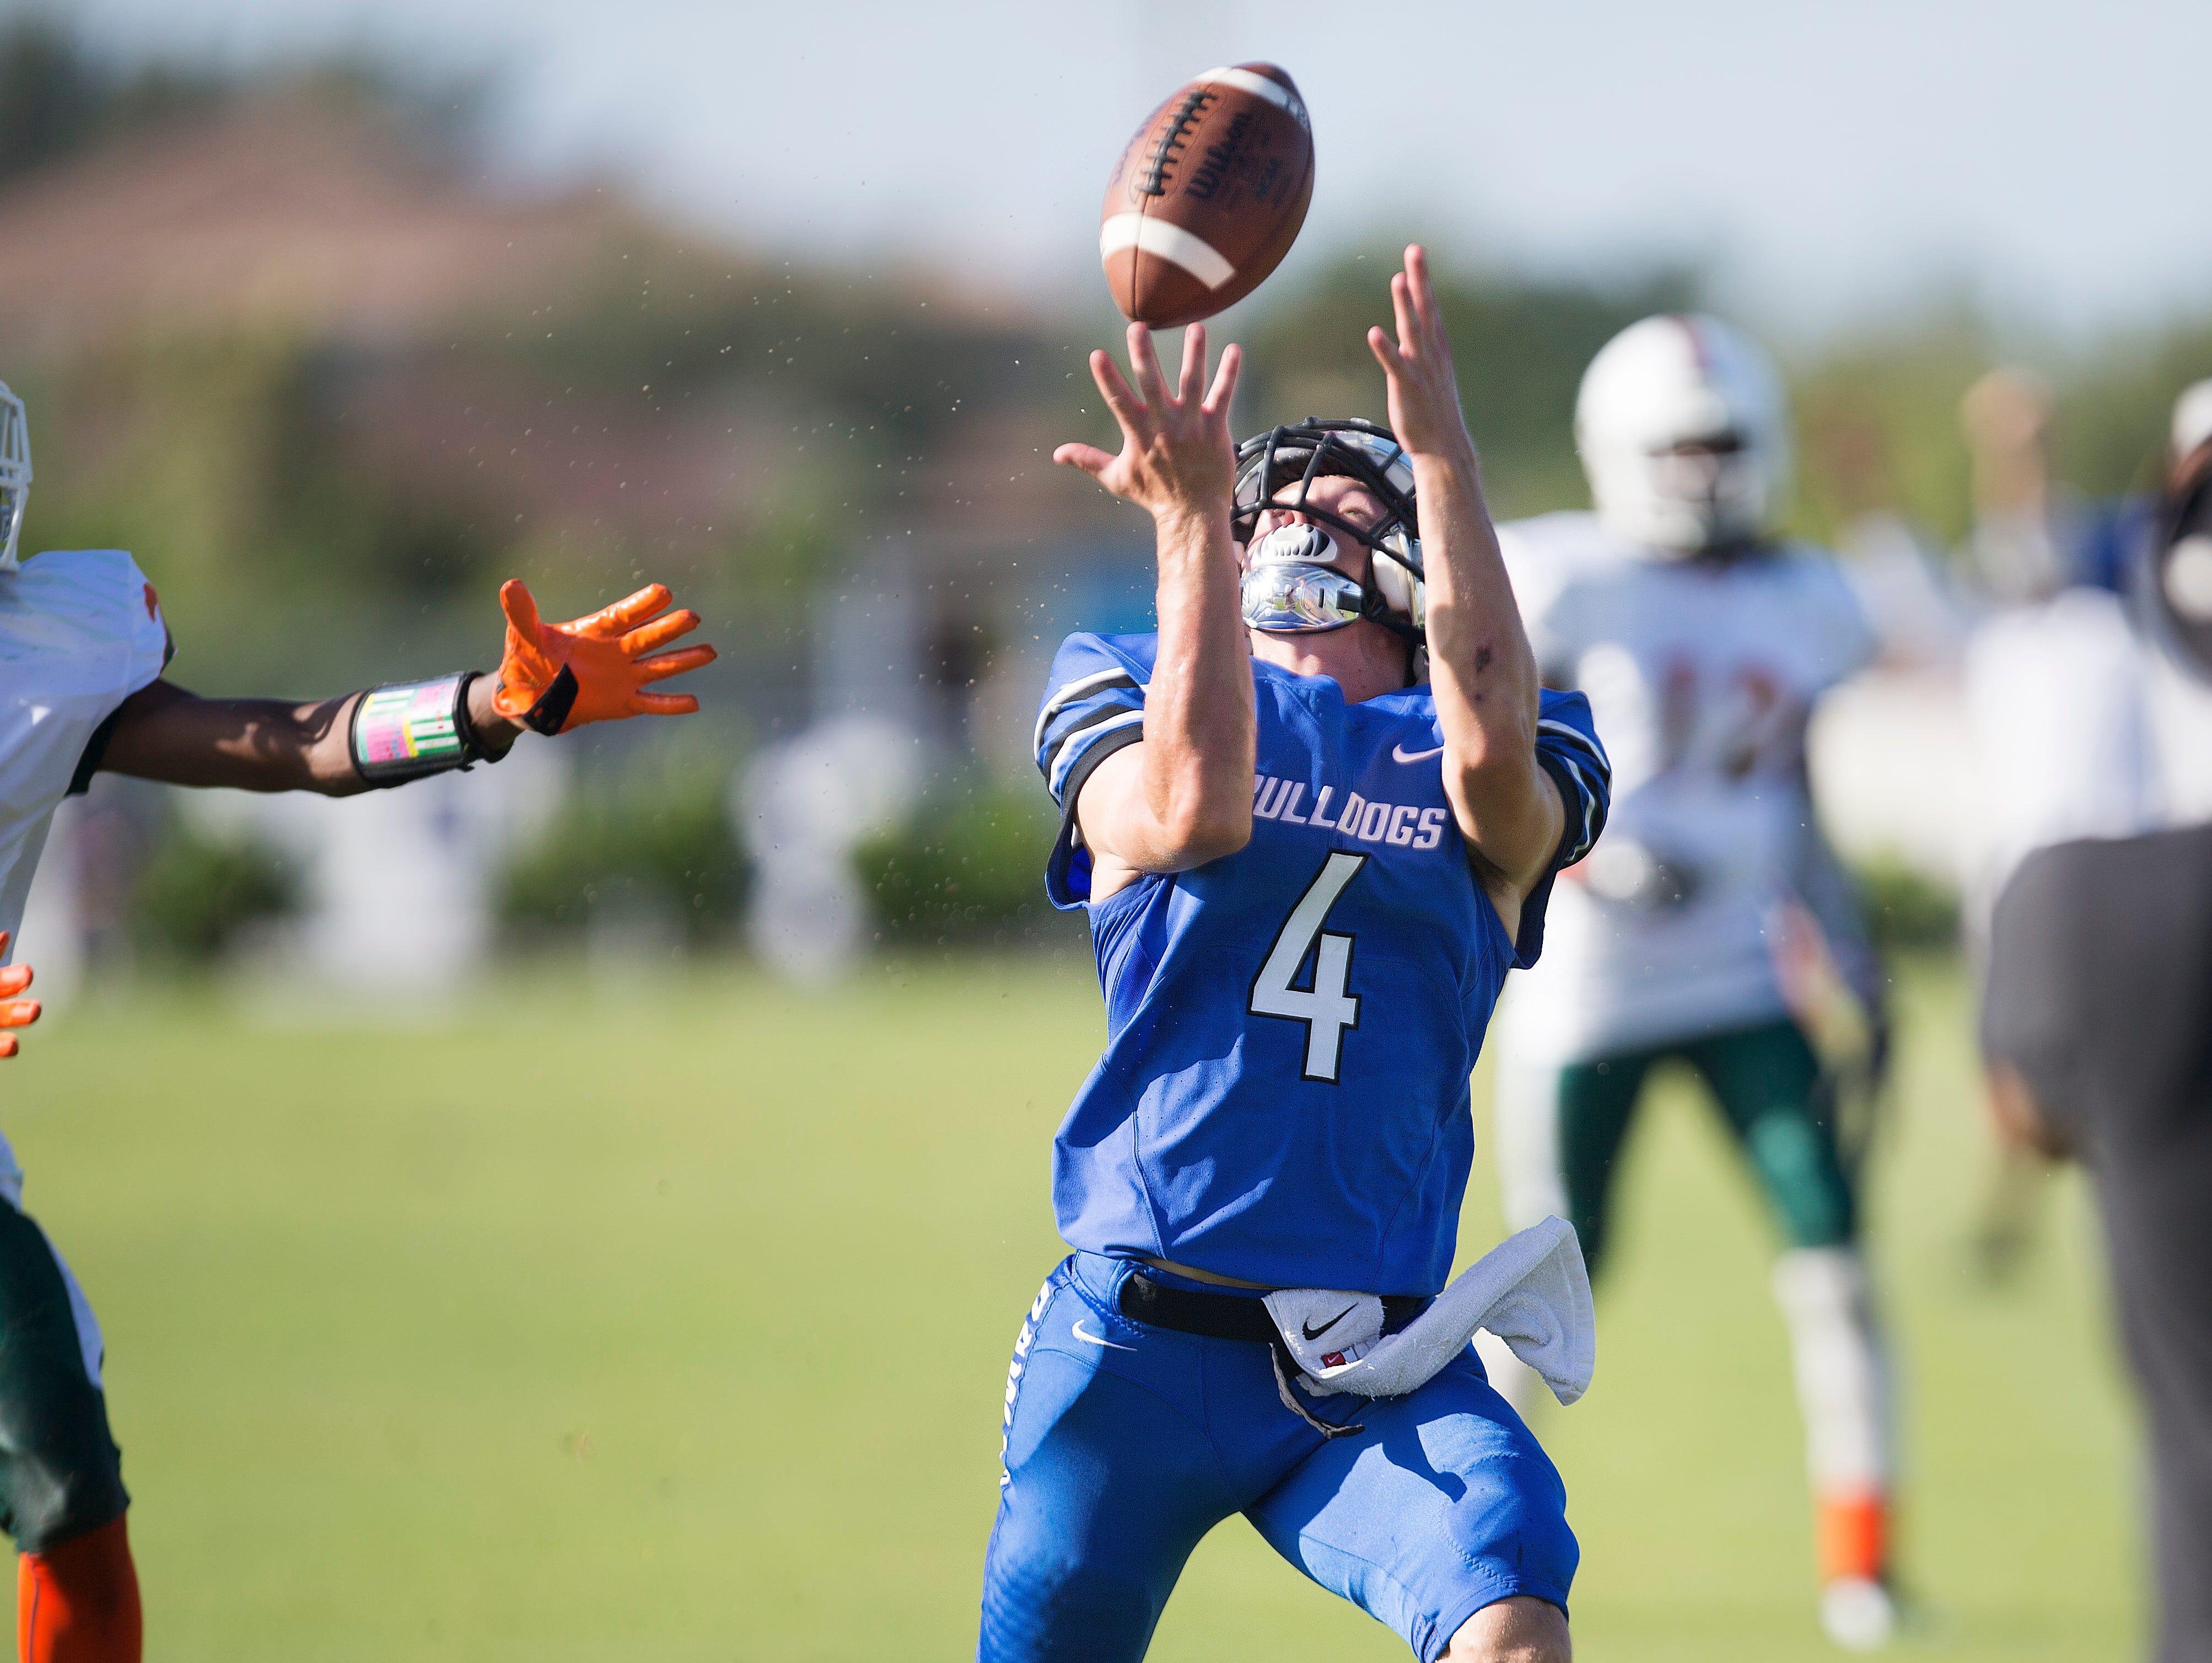 Ida Baker High School's Luke Endsley catches a touchdown Saturday against Dunbar at Ida Baker High School in Cape Coral.